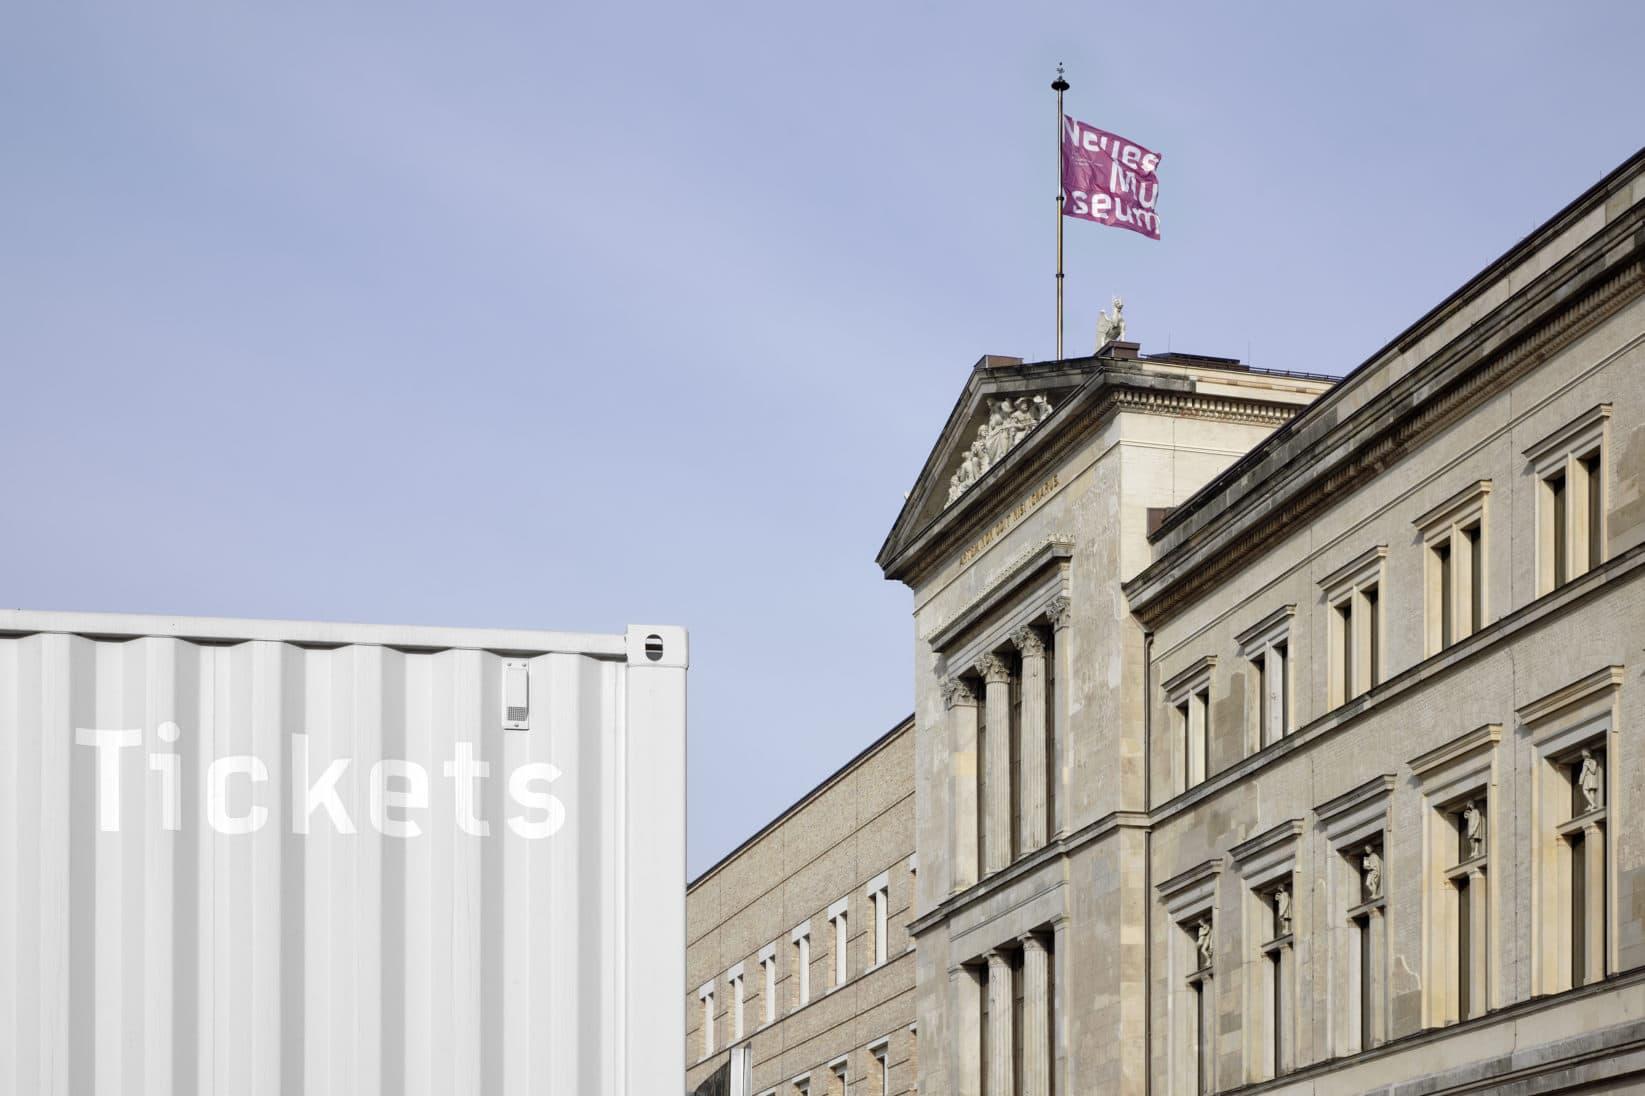 Museumsinsel Berlin Signage Dachfahnen